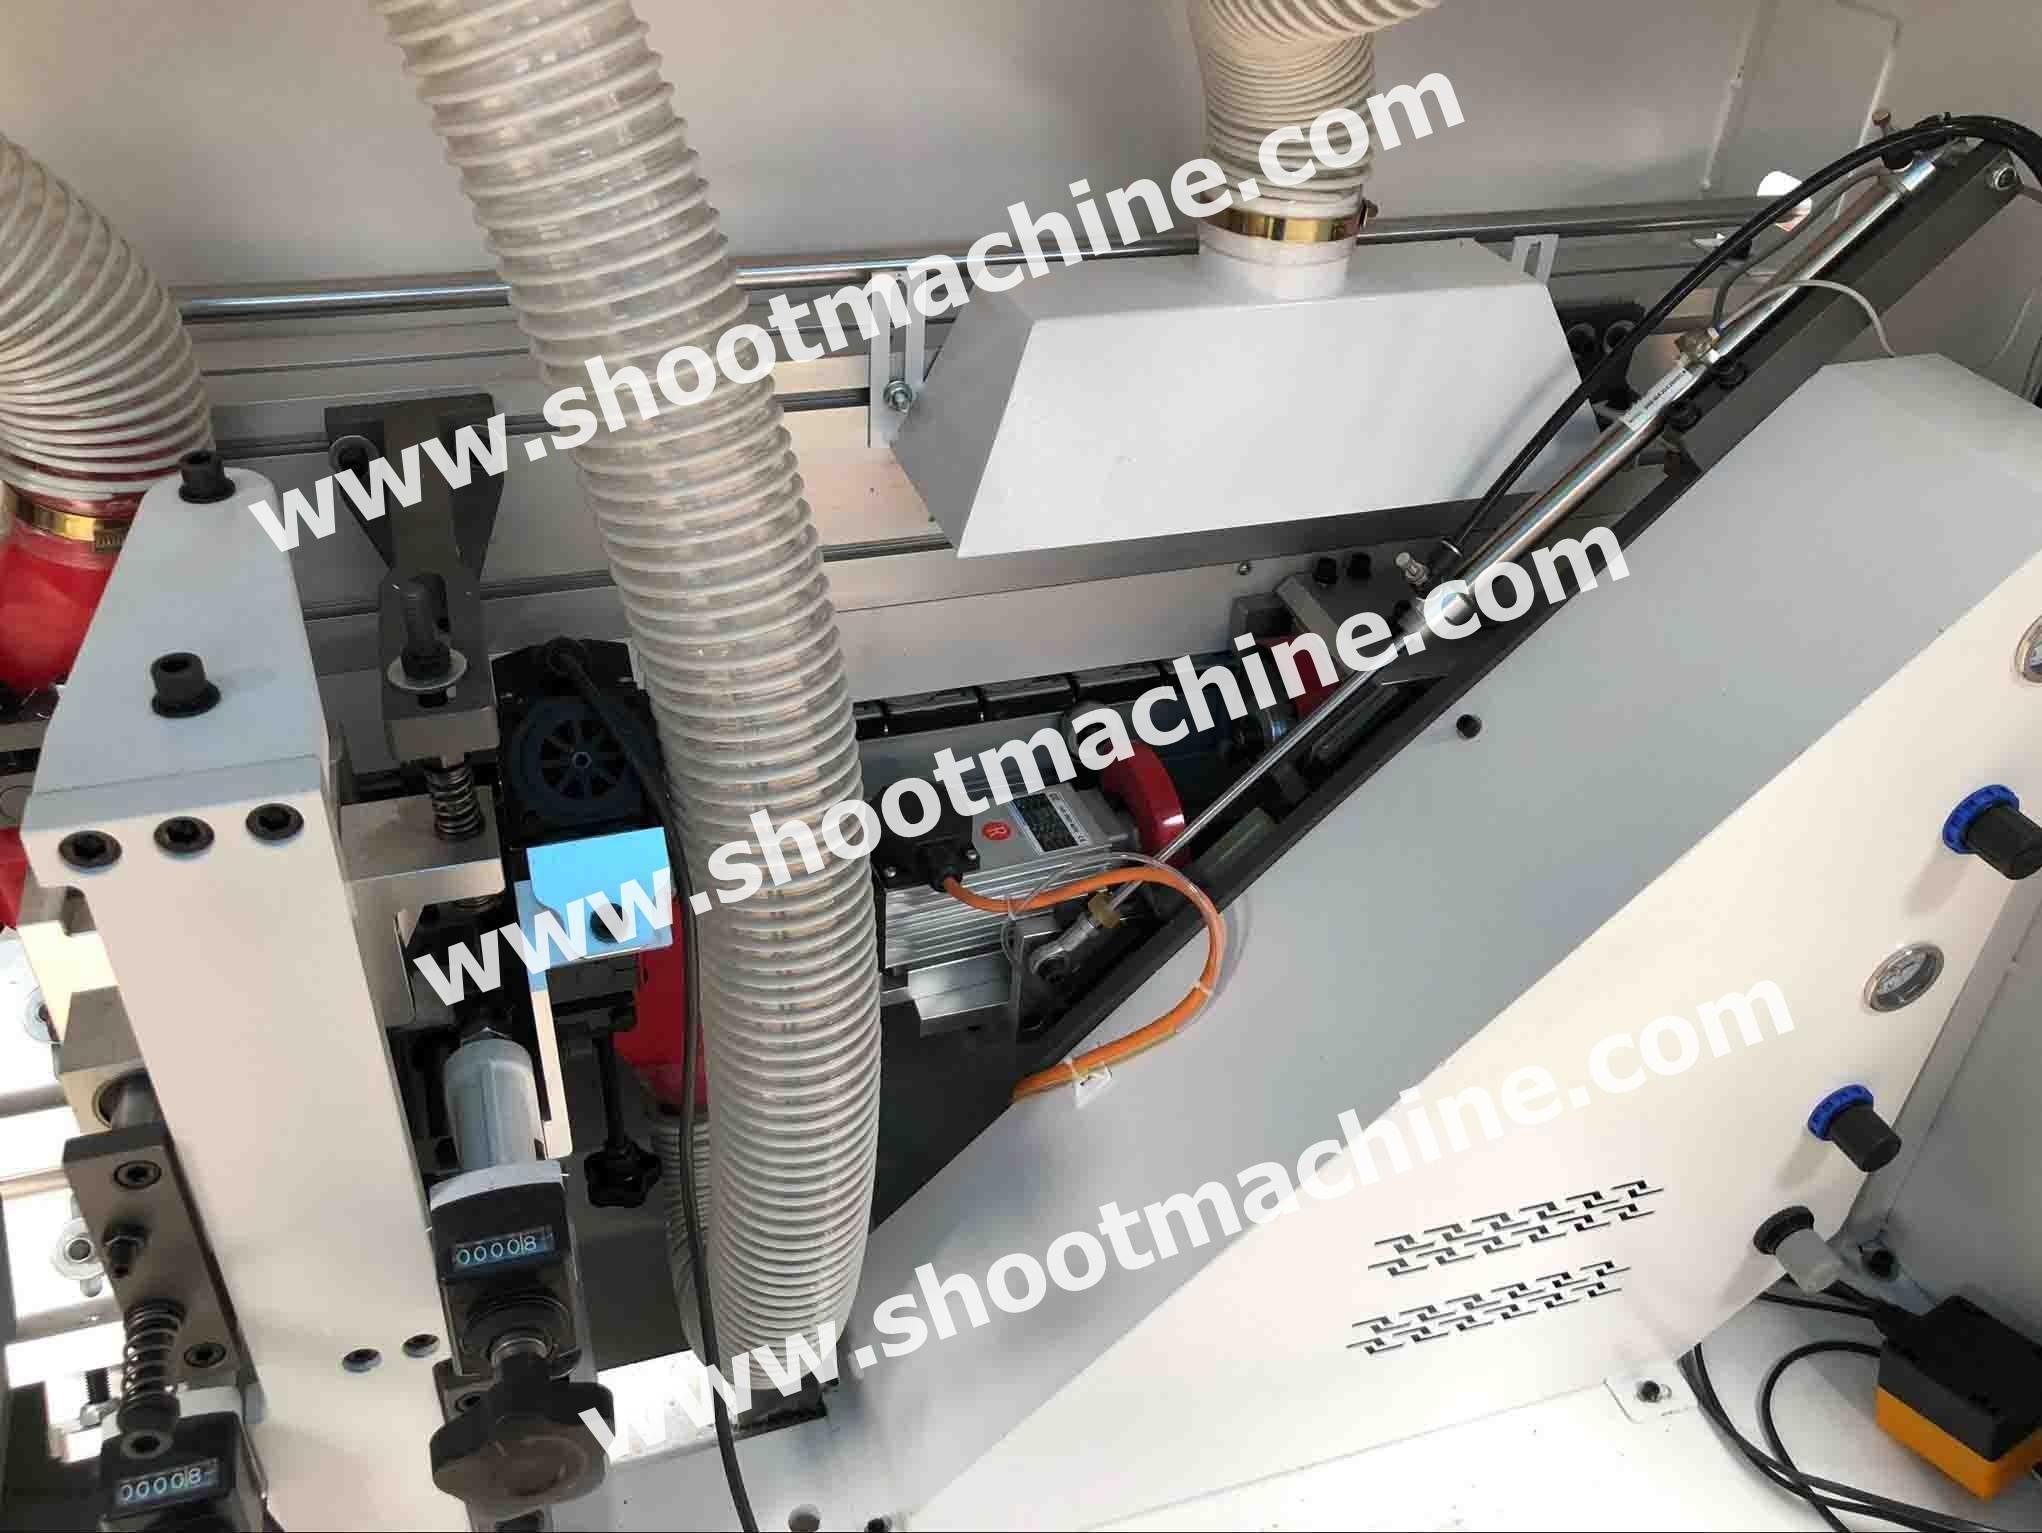 Woodworking High Quality Edge PVC Bander Machine, SH260 3